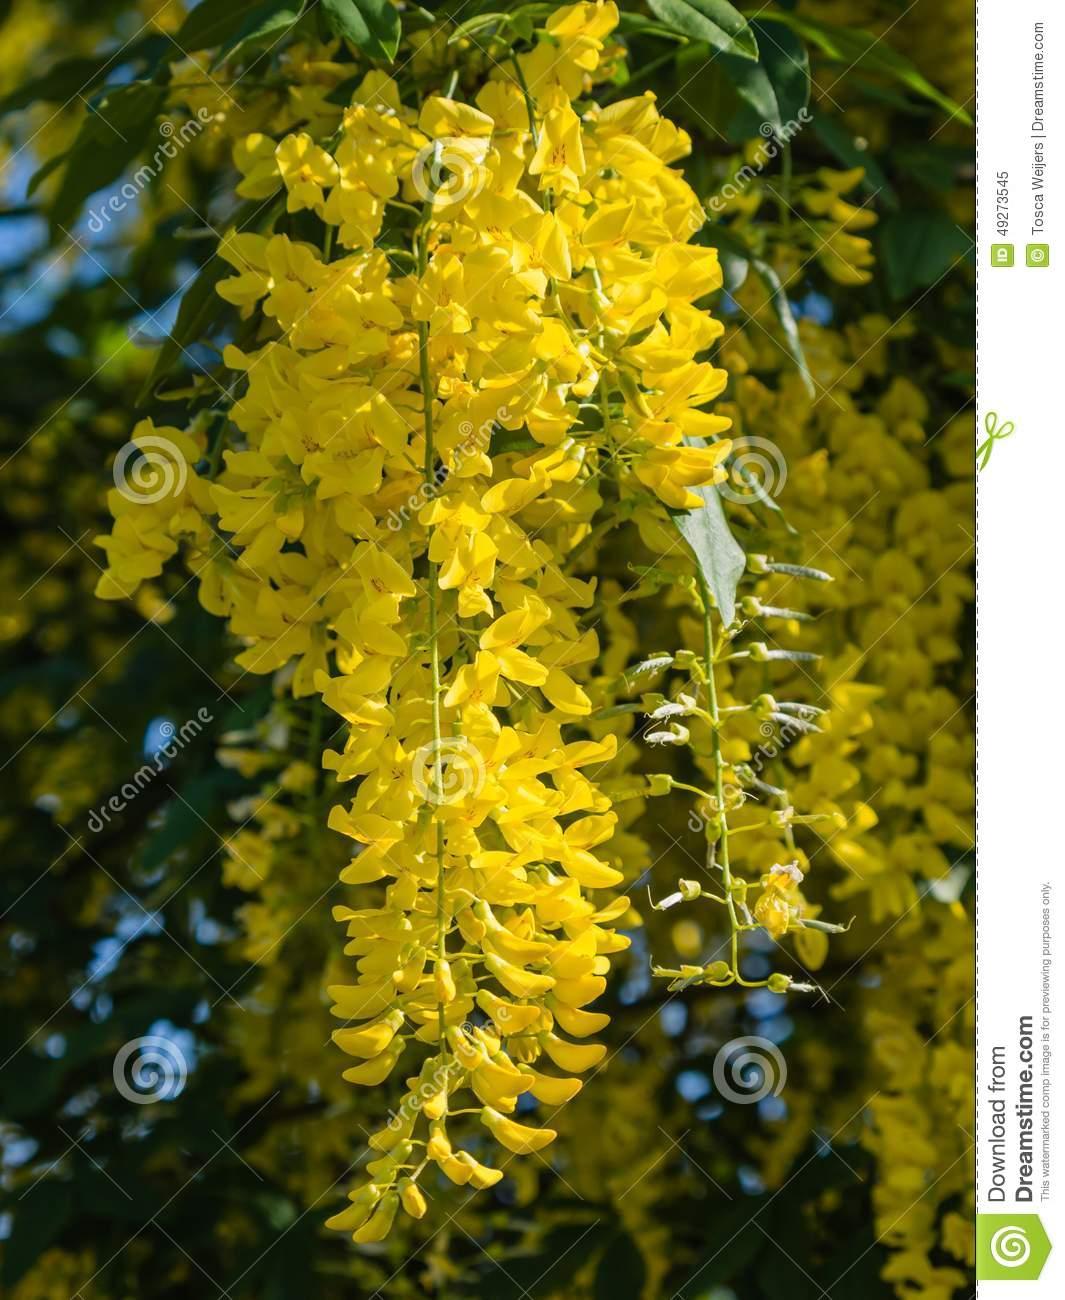 Laburnum Anagyroides Or Golden Rain Plant Stock Photo.